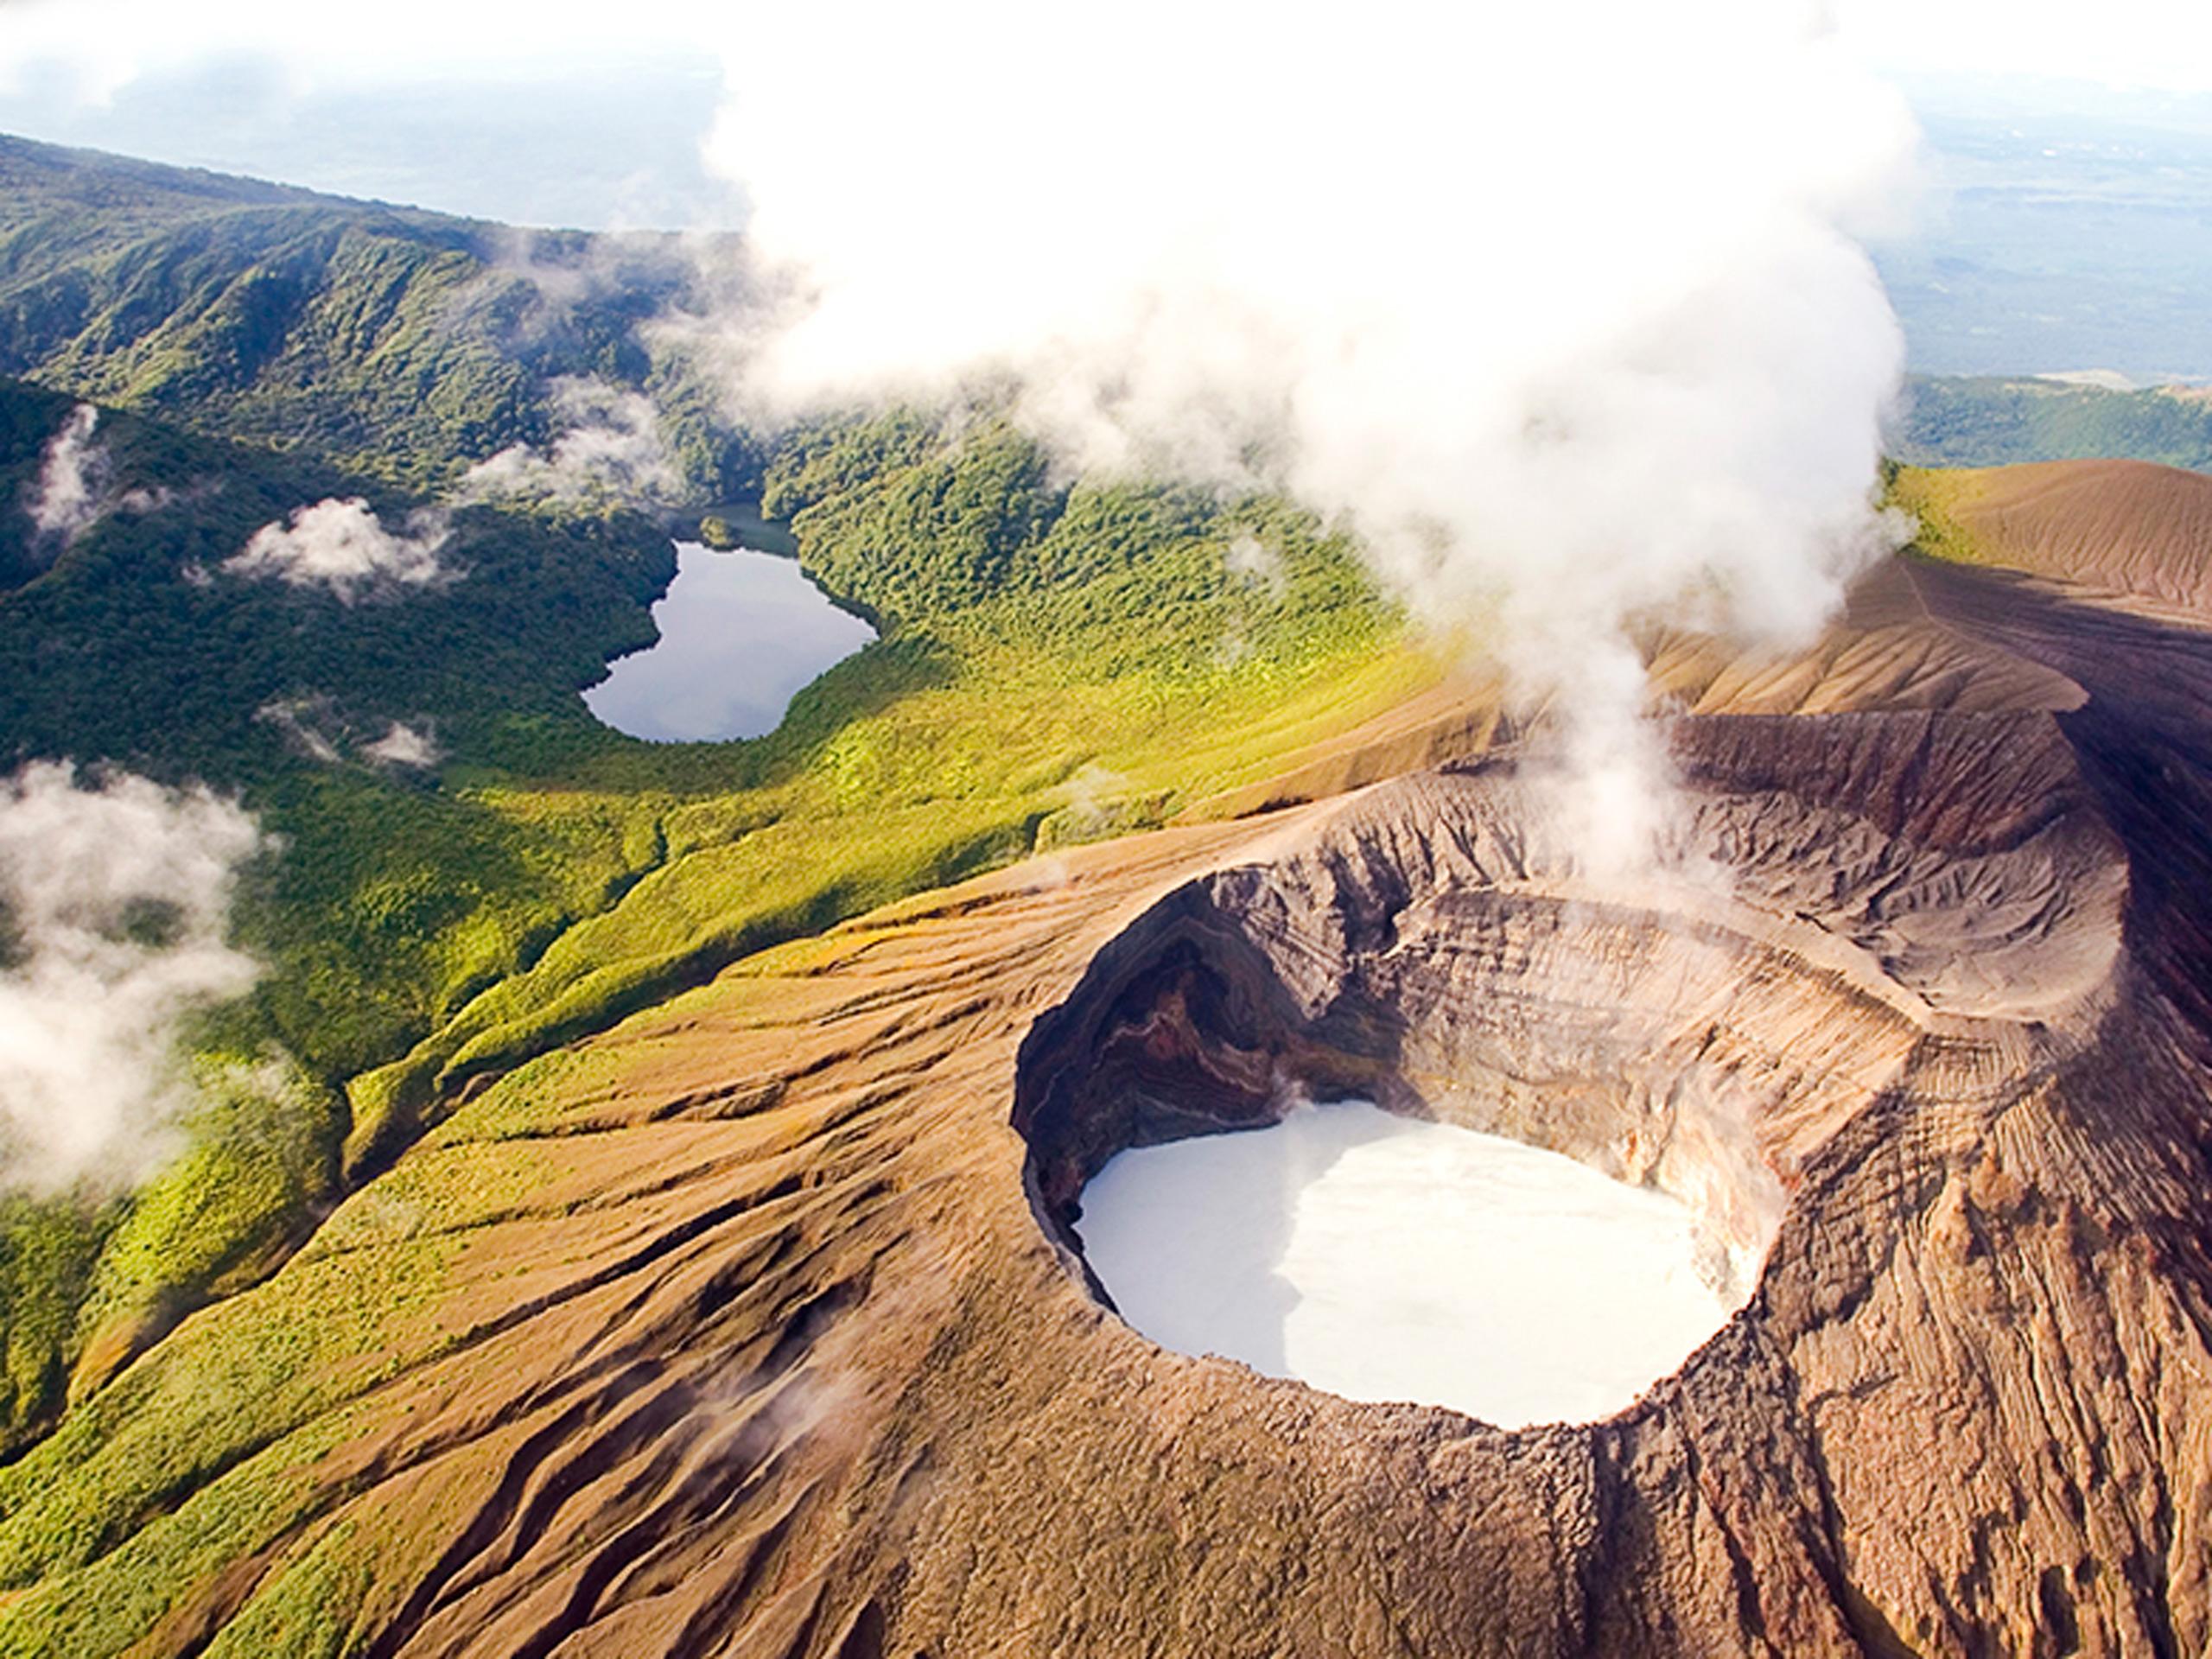 Volcano Rincon de la Vieja panoramic view